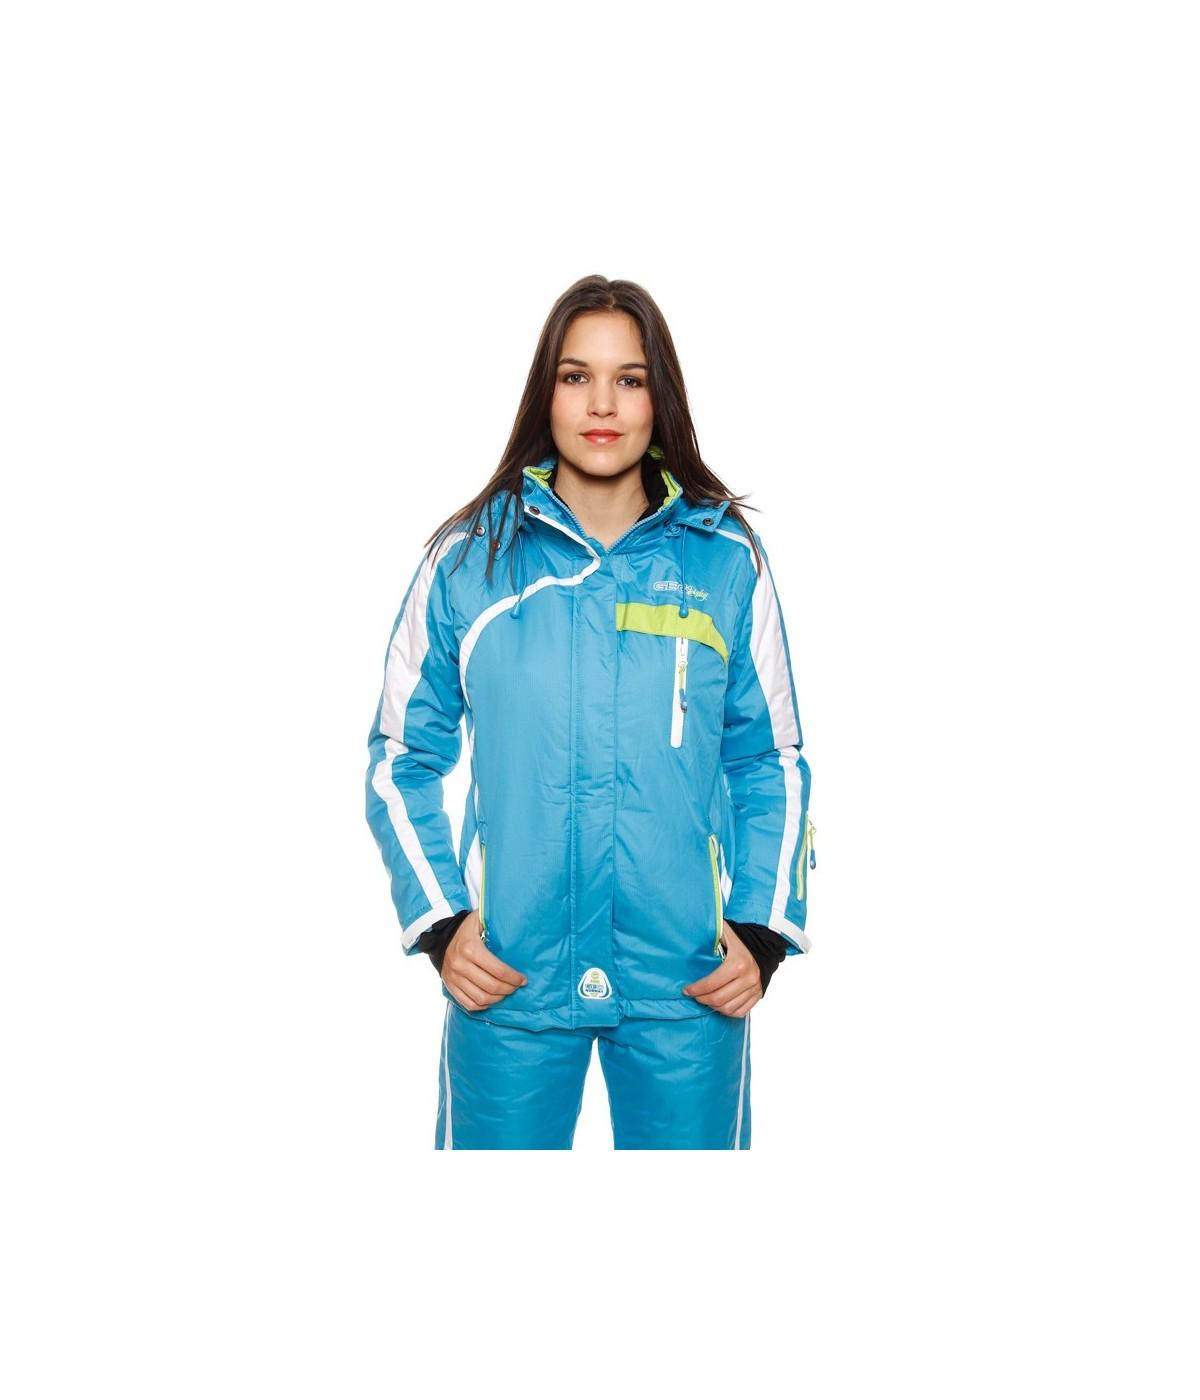 Blouson de Ski Geographical Norway Wanda Turquoise